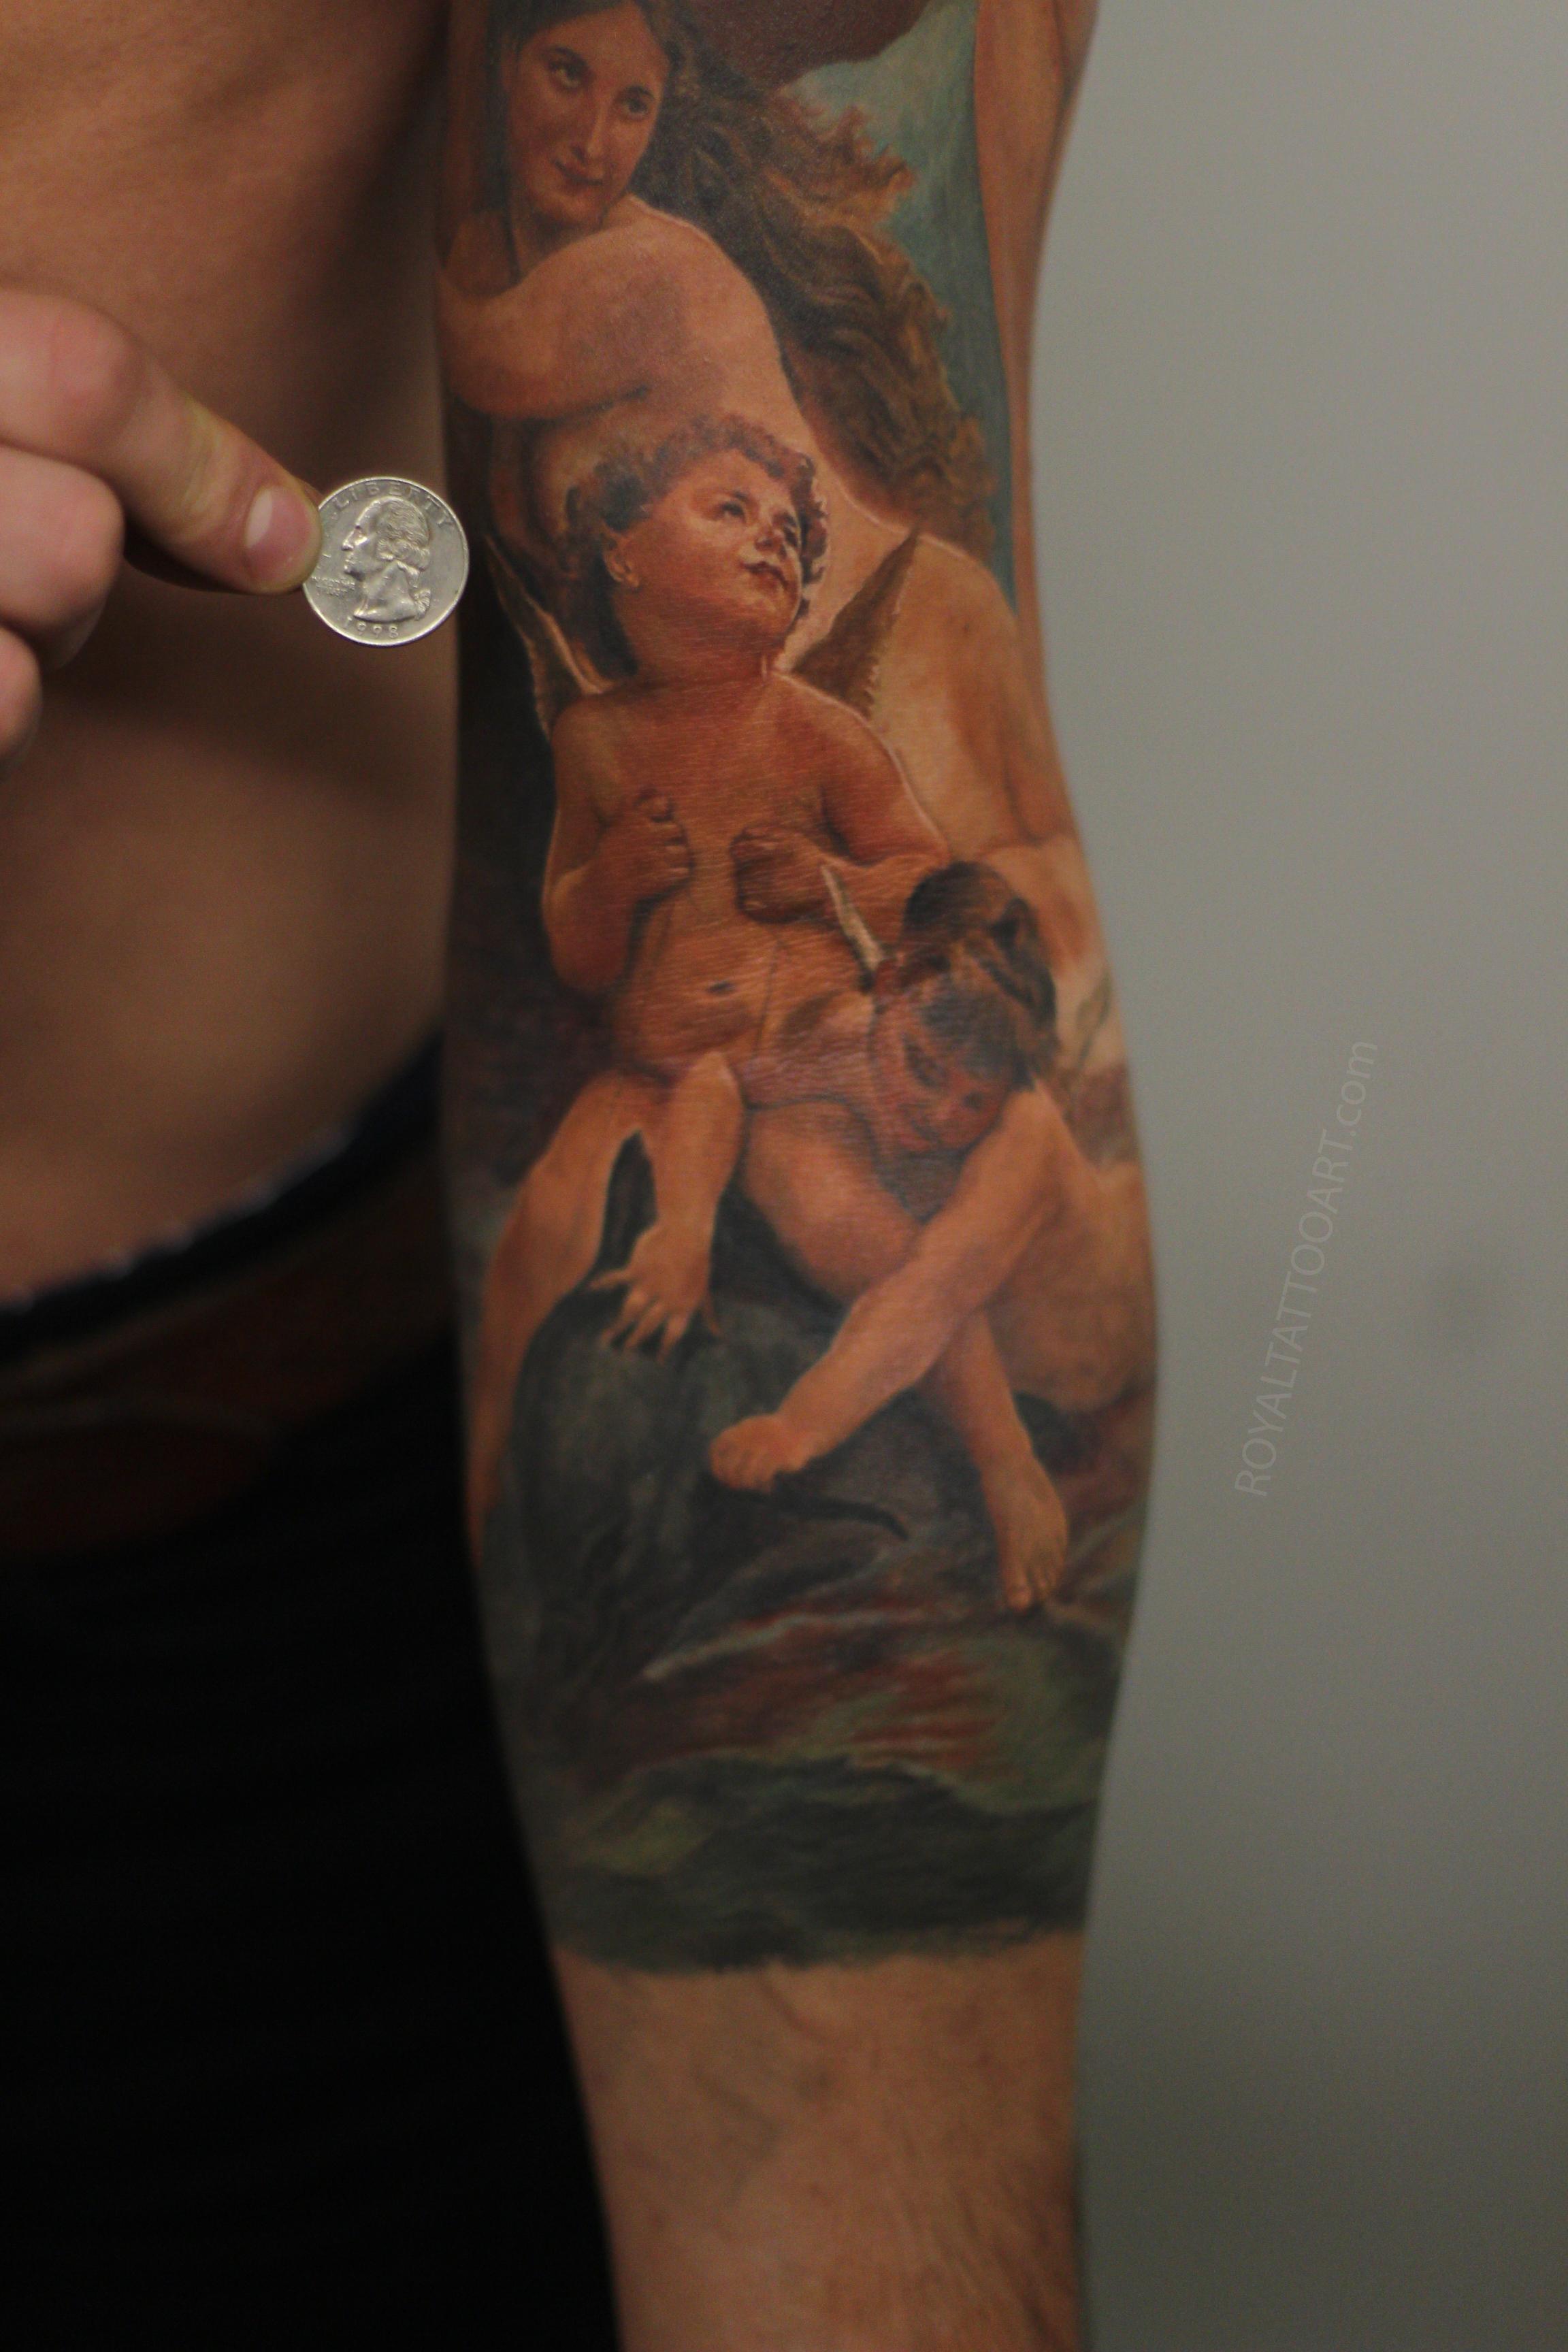 Cherub detail close up with coin tattoo Royaltattooart.jpg